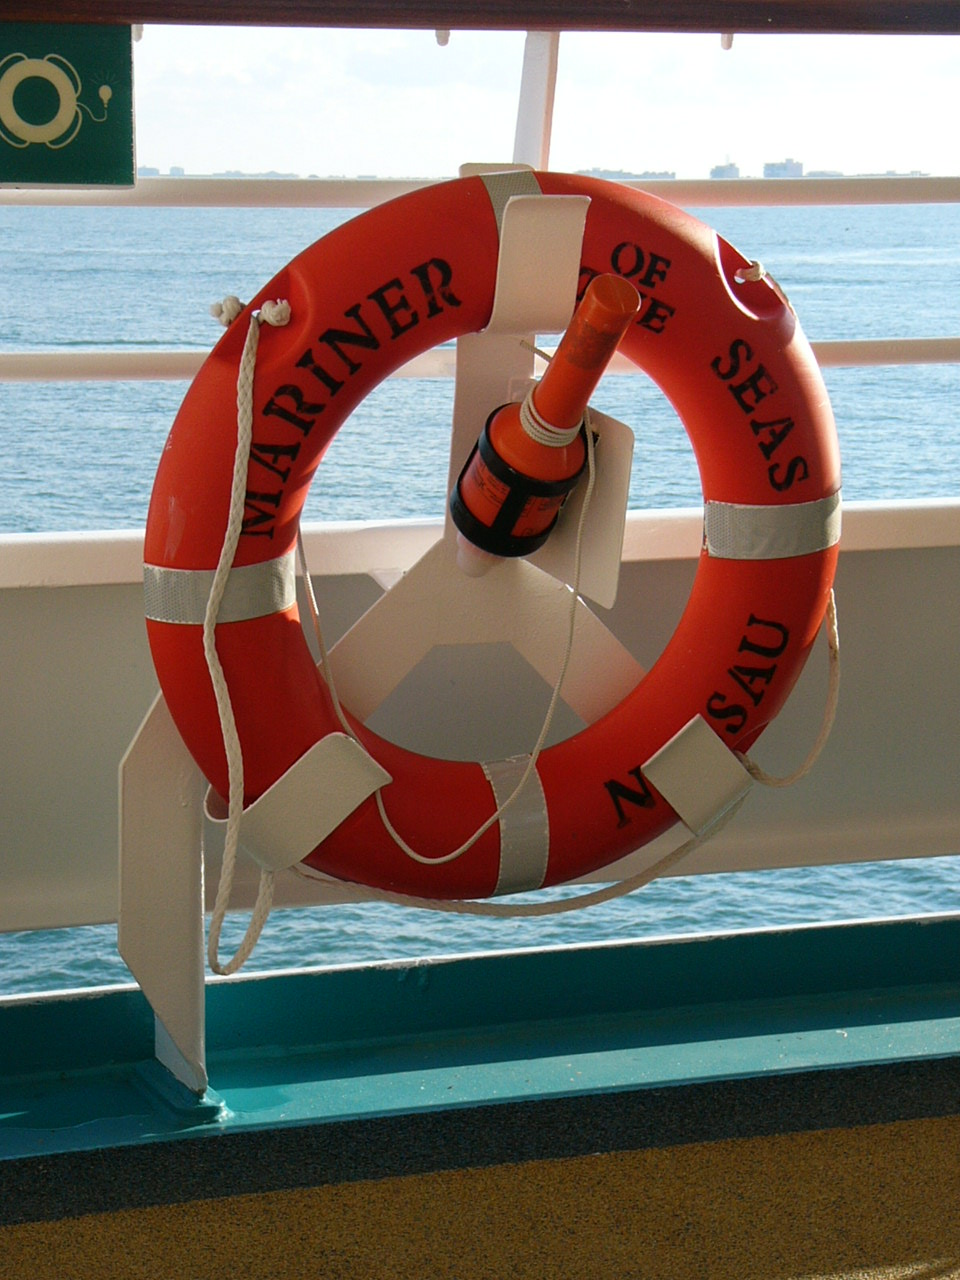 Lifebuoy Wikipedia